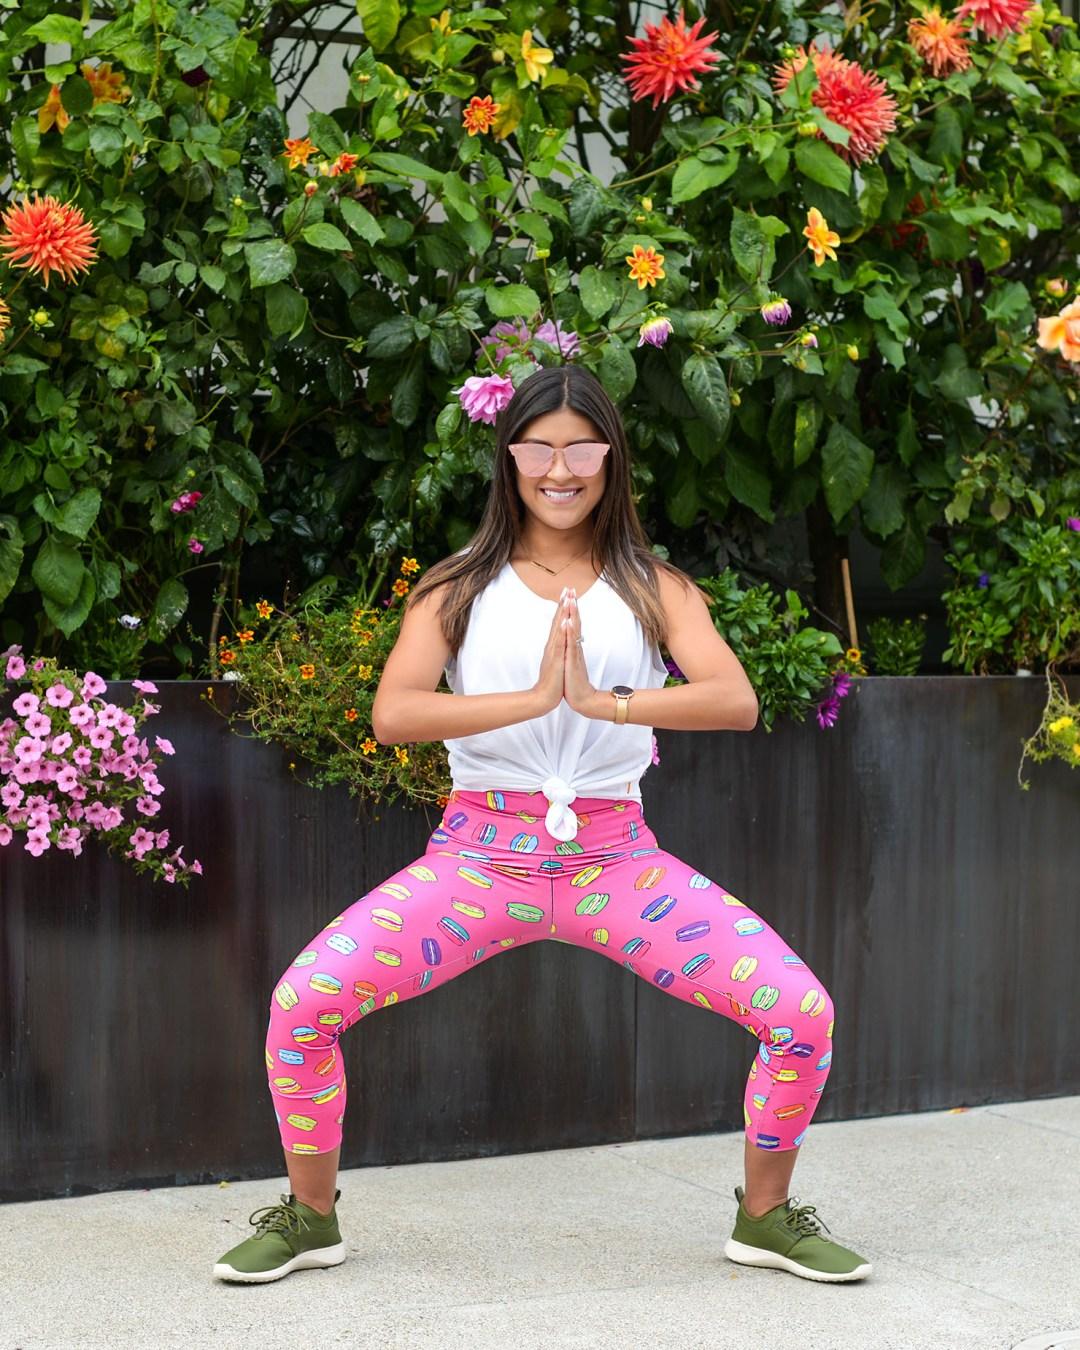 Lifestyle blogger Kelsey Kaplan of Kelsey Kaplan Fashion wearing green Nike sneakers and New Orleans Yoga Apparel